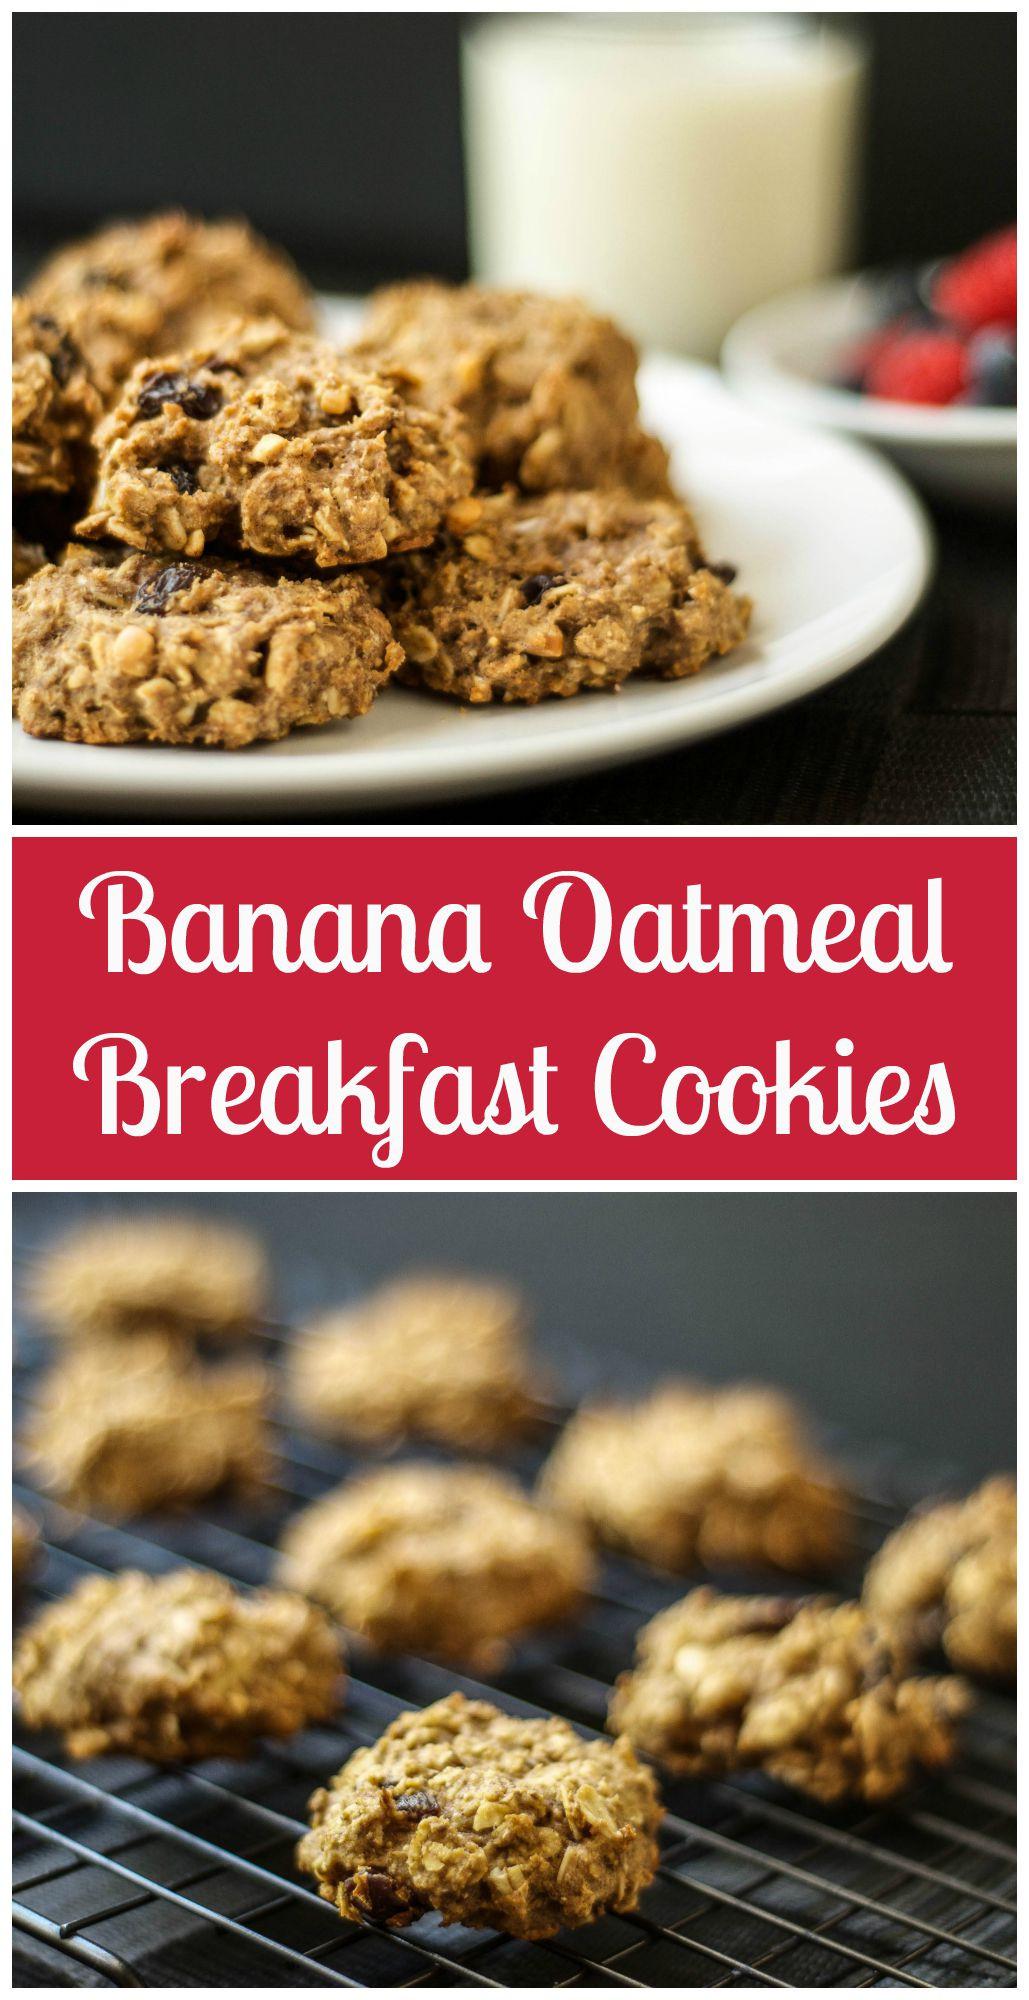 Banana Oatmeal Breakfast Cookies  Banana Oatmeal Breakfast Cookies Vegan The Wholesome Fork